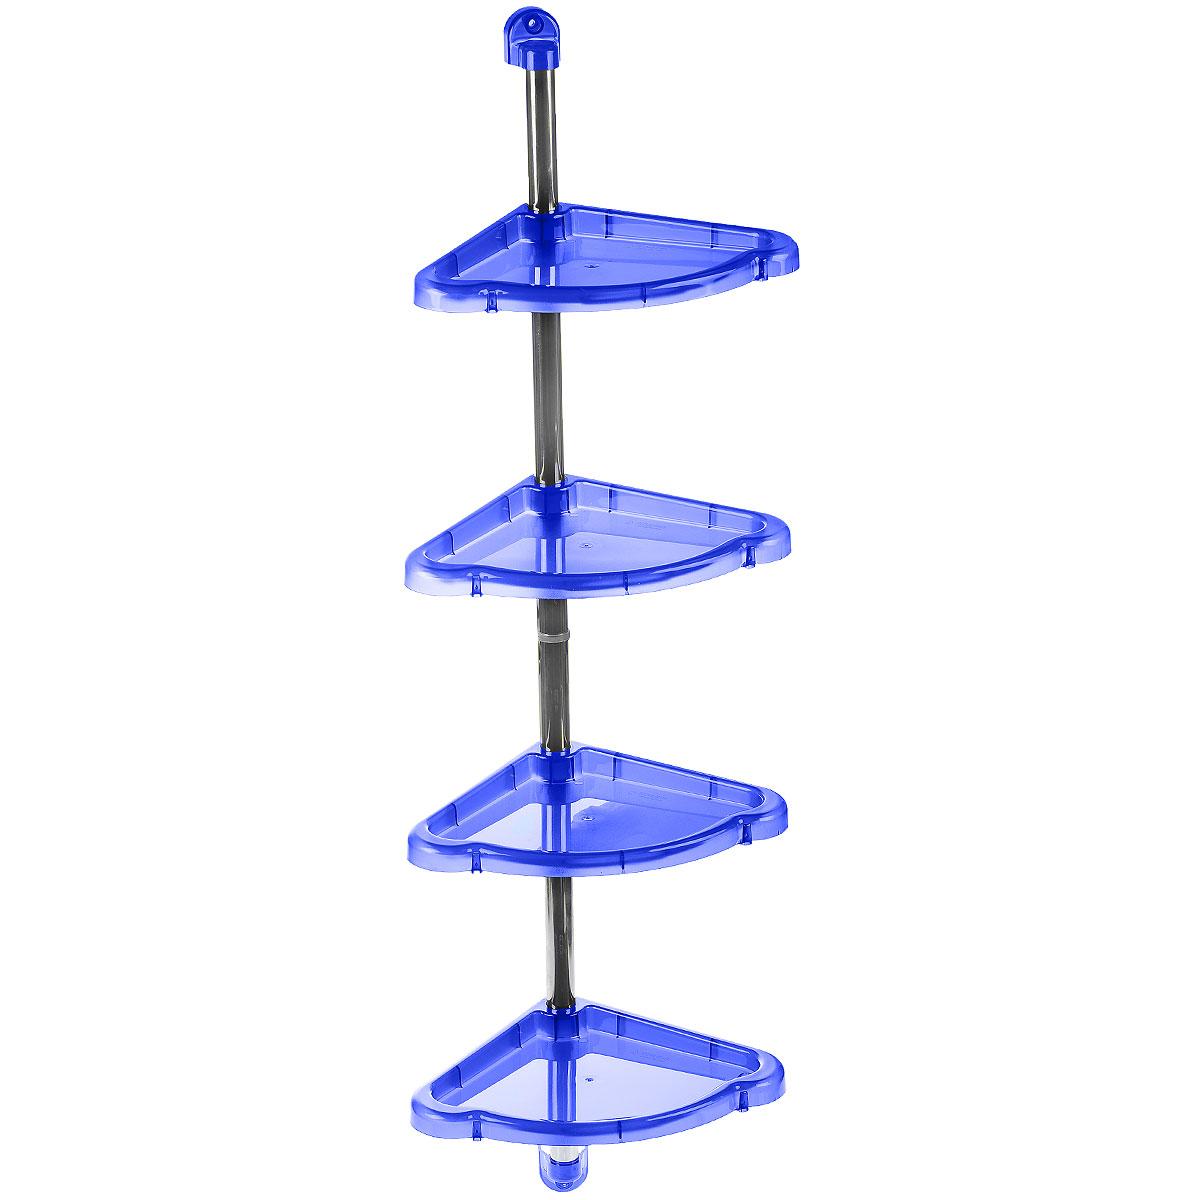 Этажерка угловая Berossi Elancia, 2-4-х ярусная, цвет: синий, 24 х 24 х 98,3 см